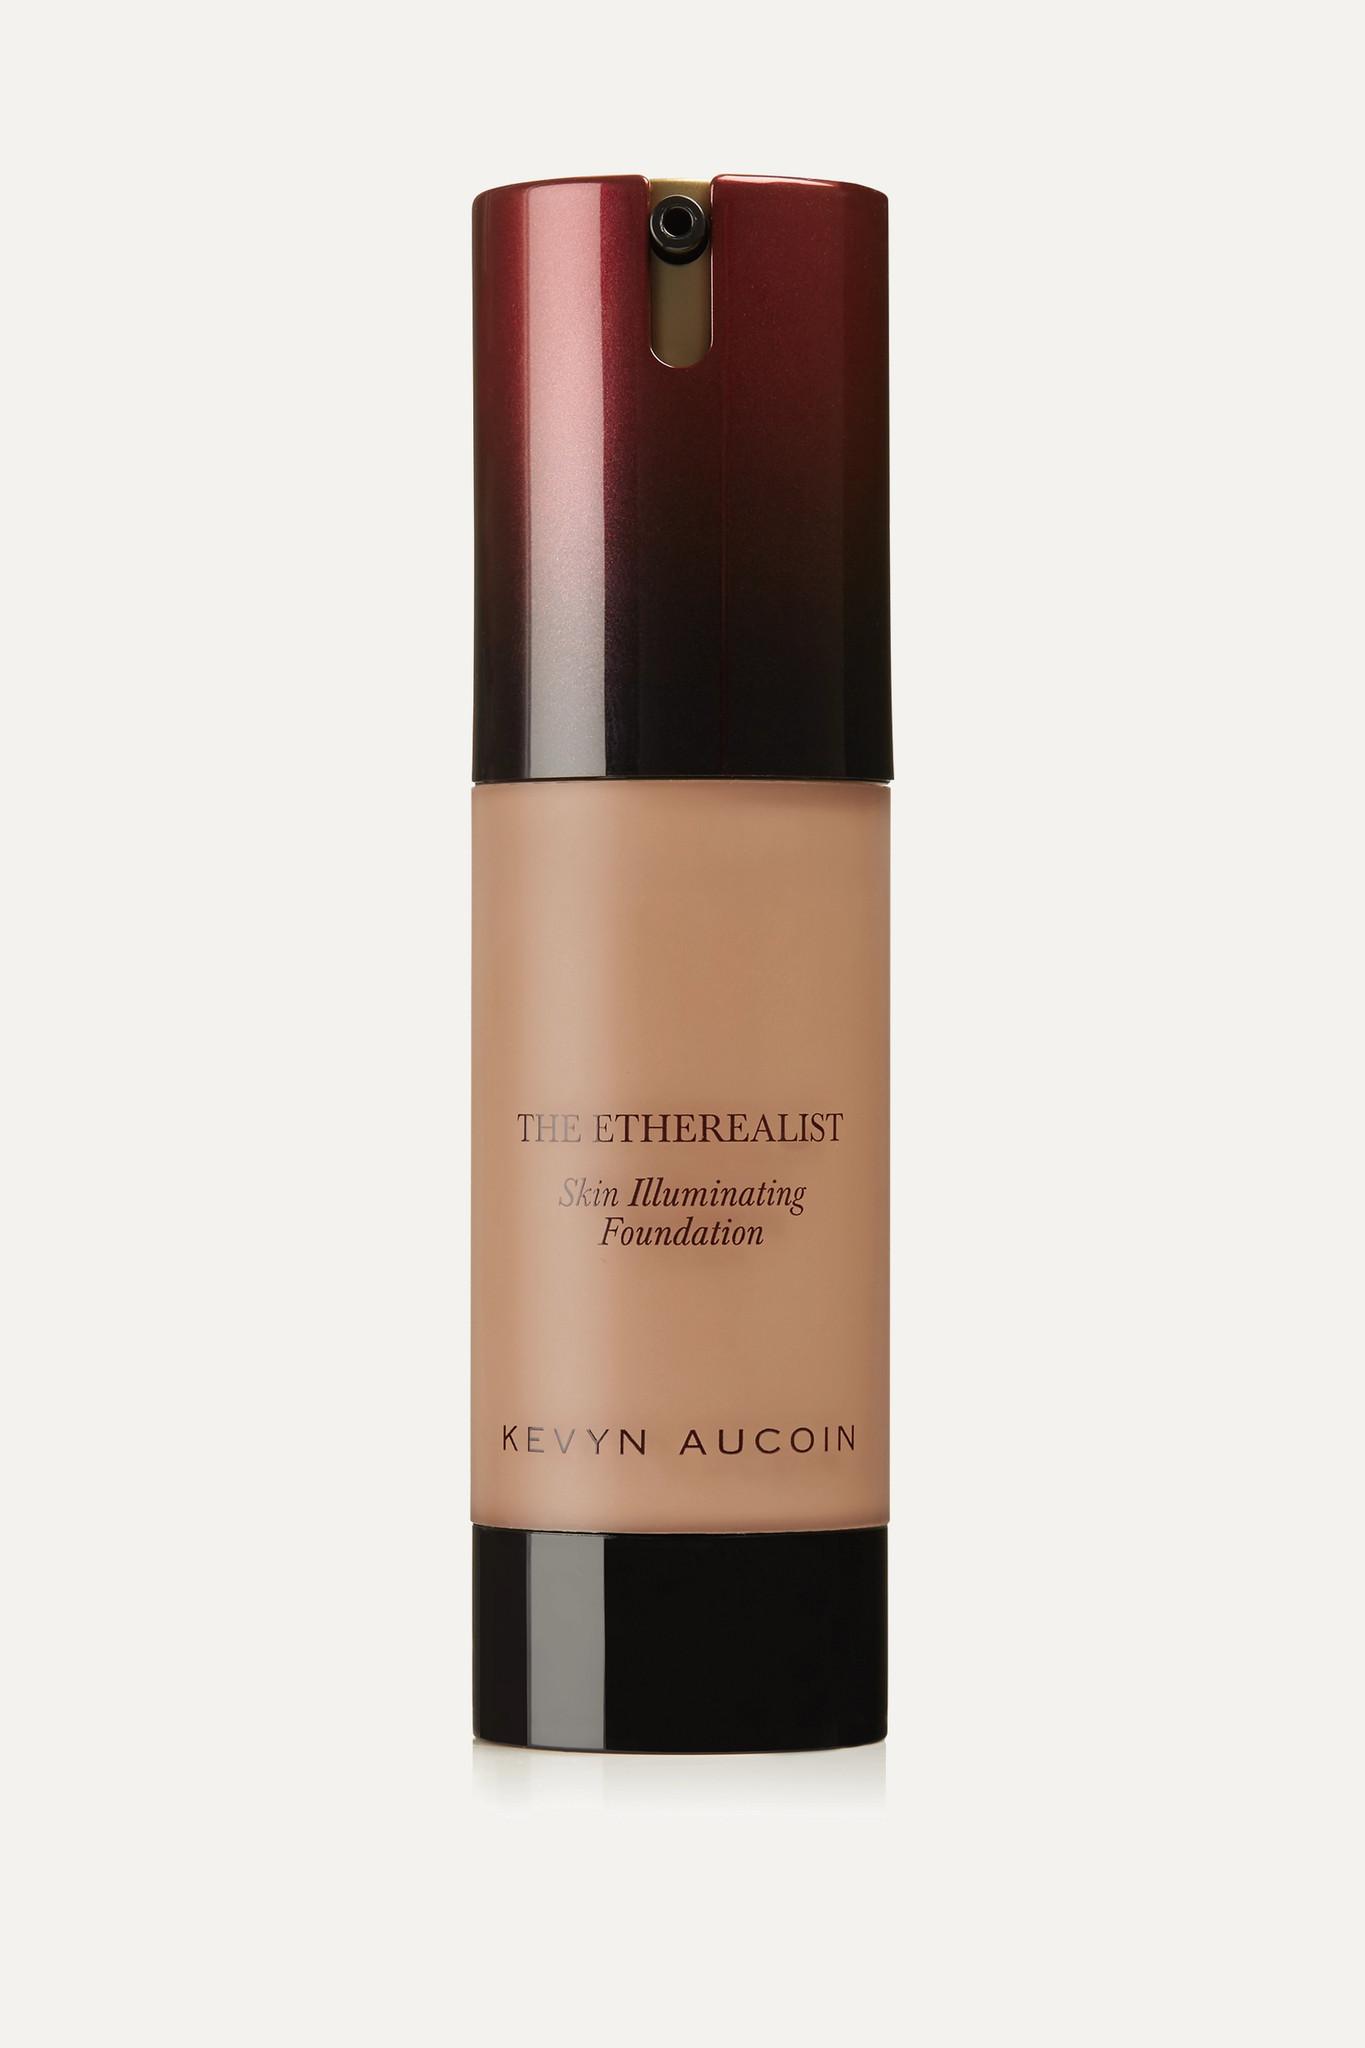 KEVYN AUCOIN - The Etherealist Skin Illuminating Foundation - Medium Ef 09, 28ml - Neutrals - one si